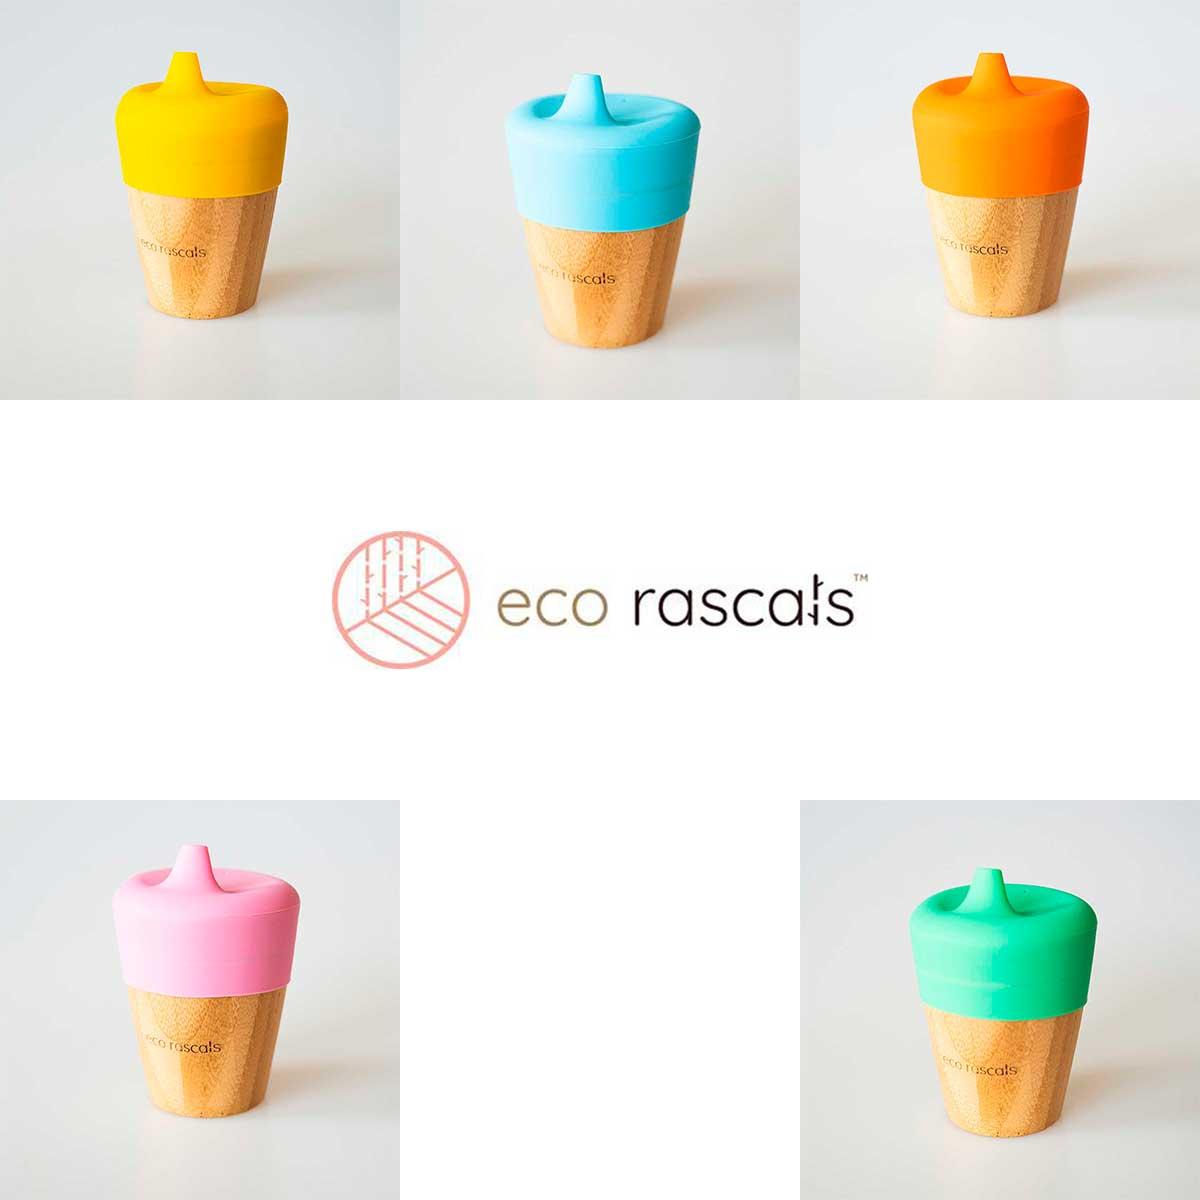 vaso-bamboo-eco-rascals-190ml-general.jpg